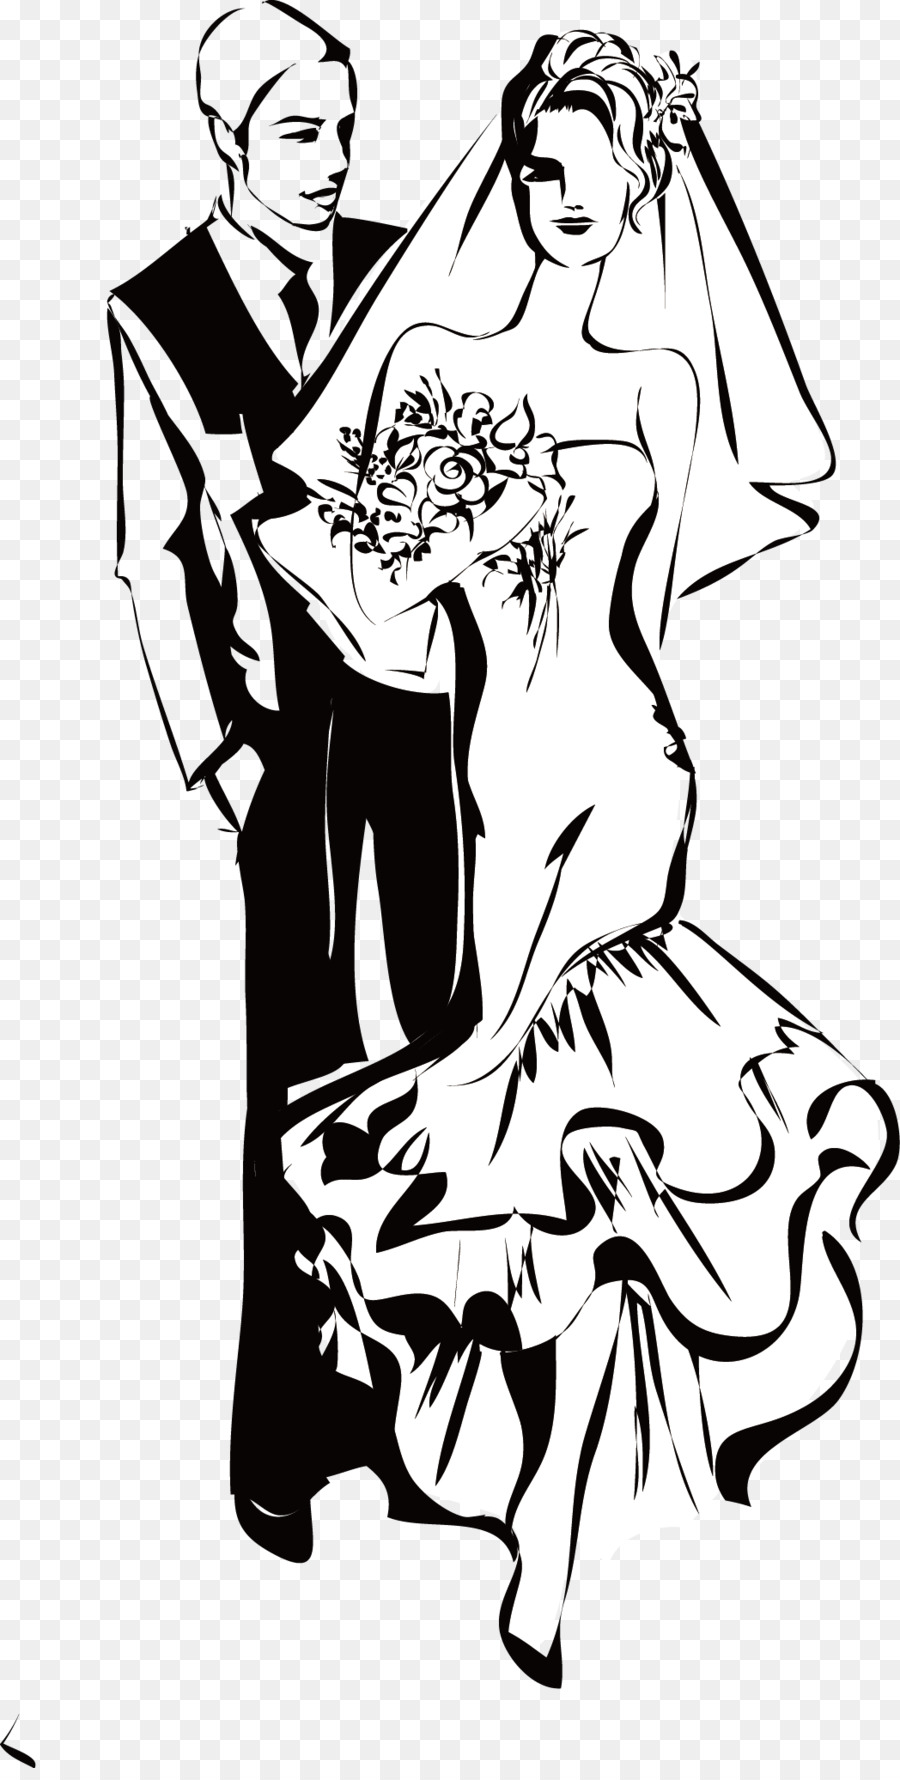 Wedding Invitation Black And White Woman Clip Art Black And White